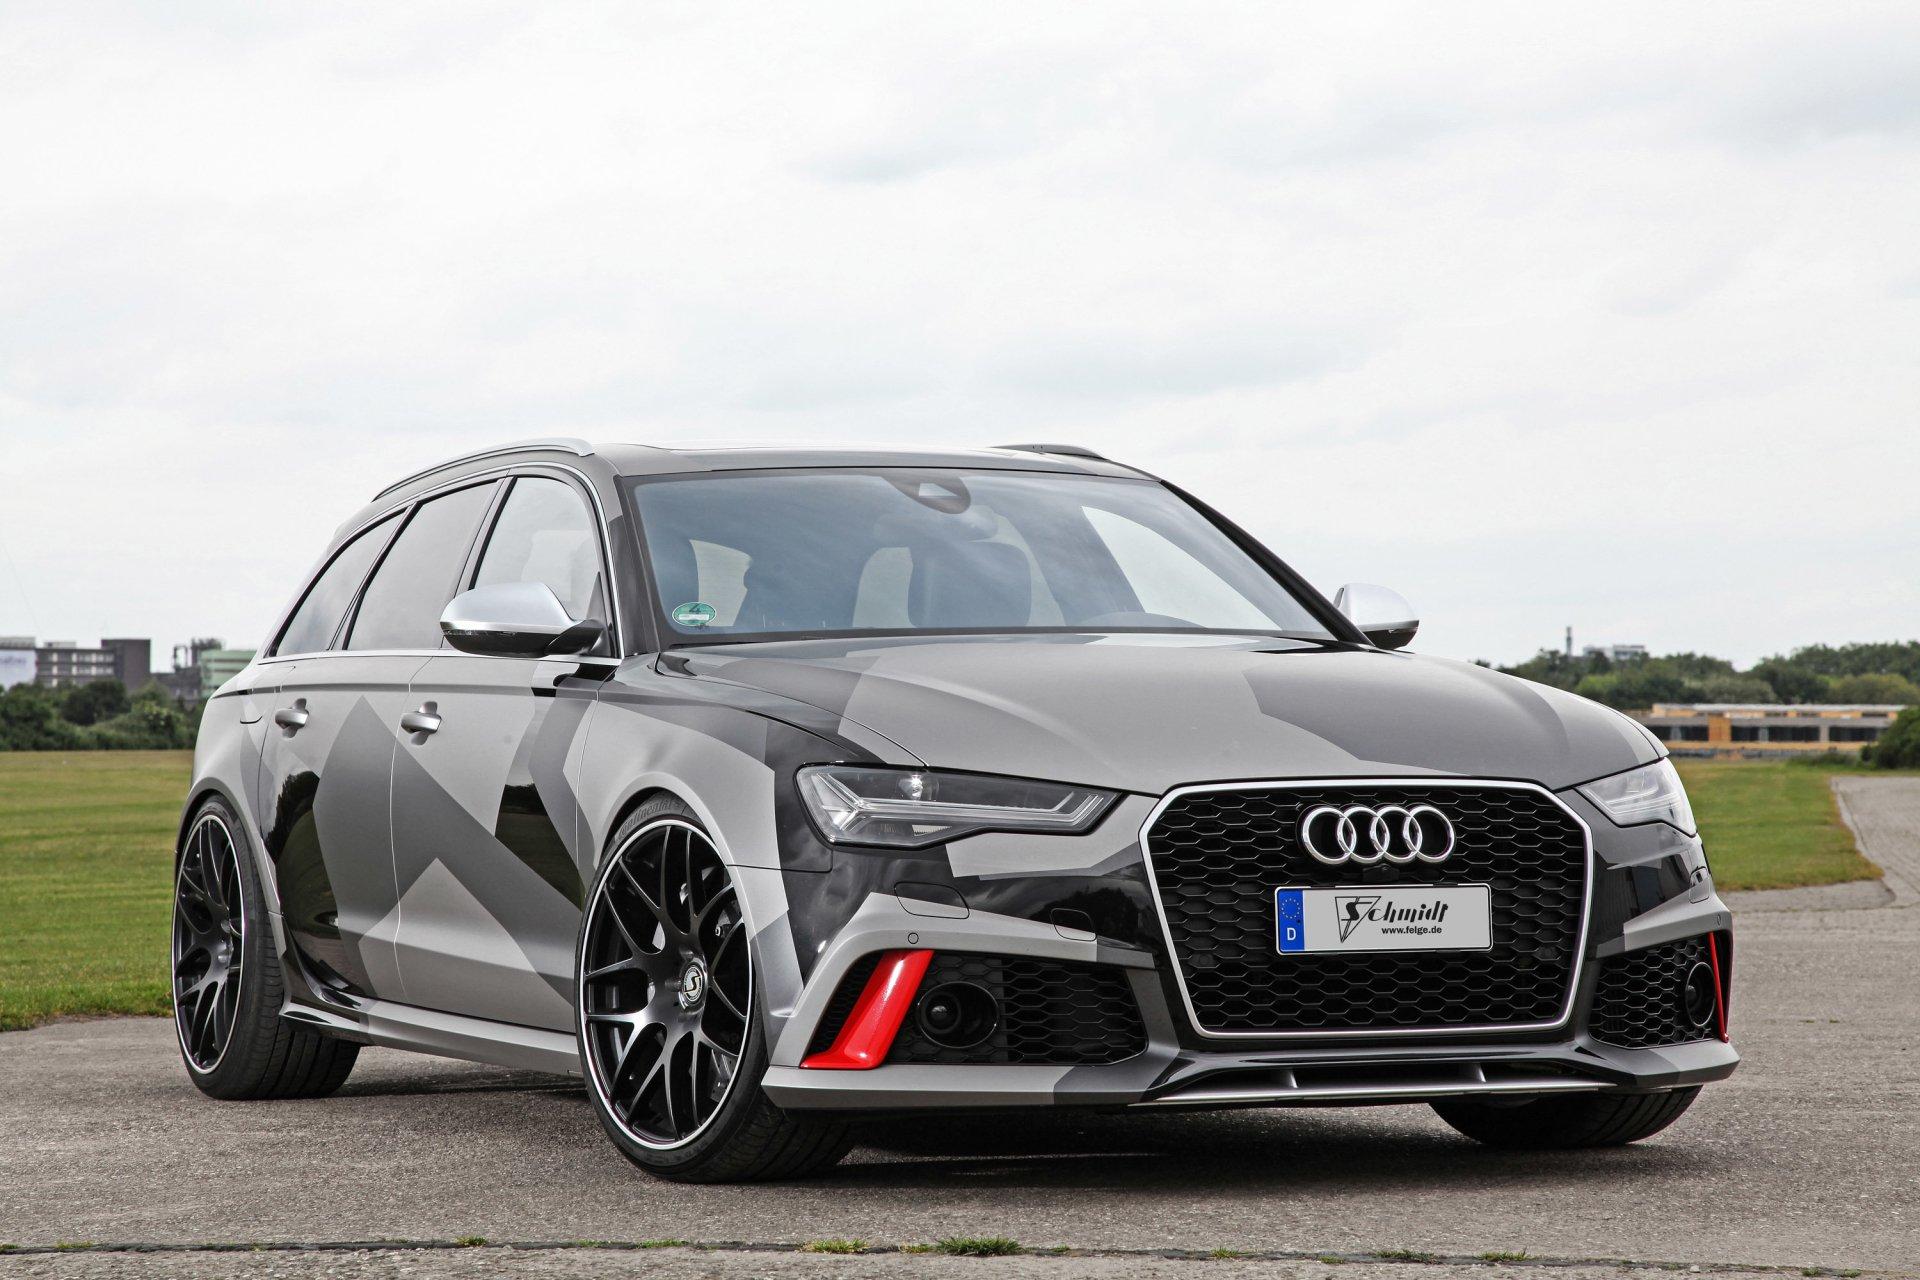 Audi RS6 Fond d'écran HD | Arrière-Plan | 3000x2000 | ID ...